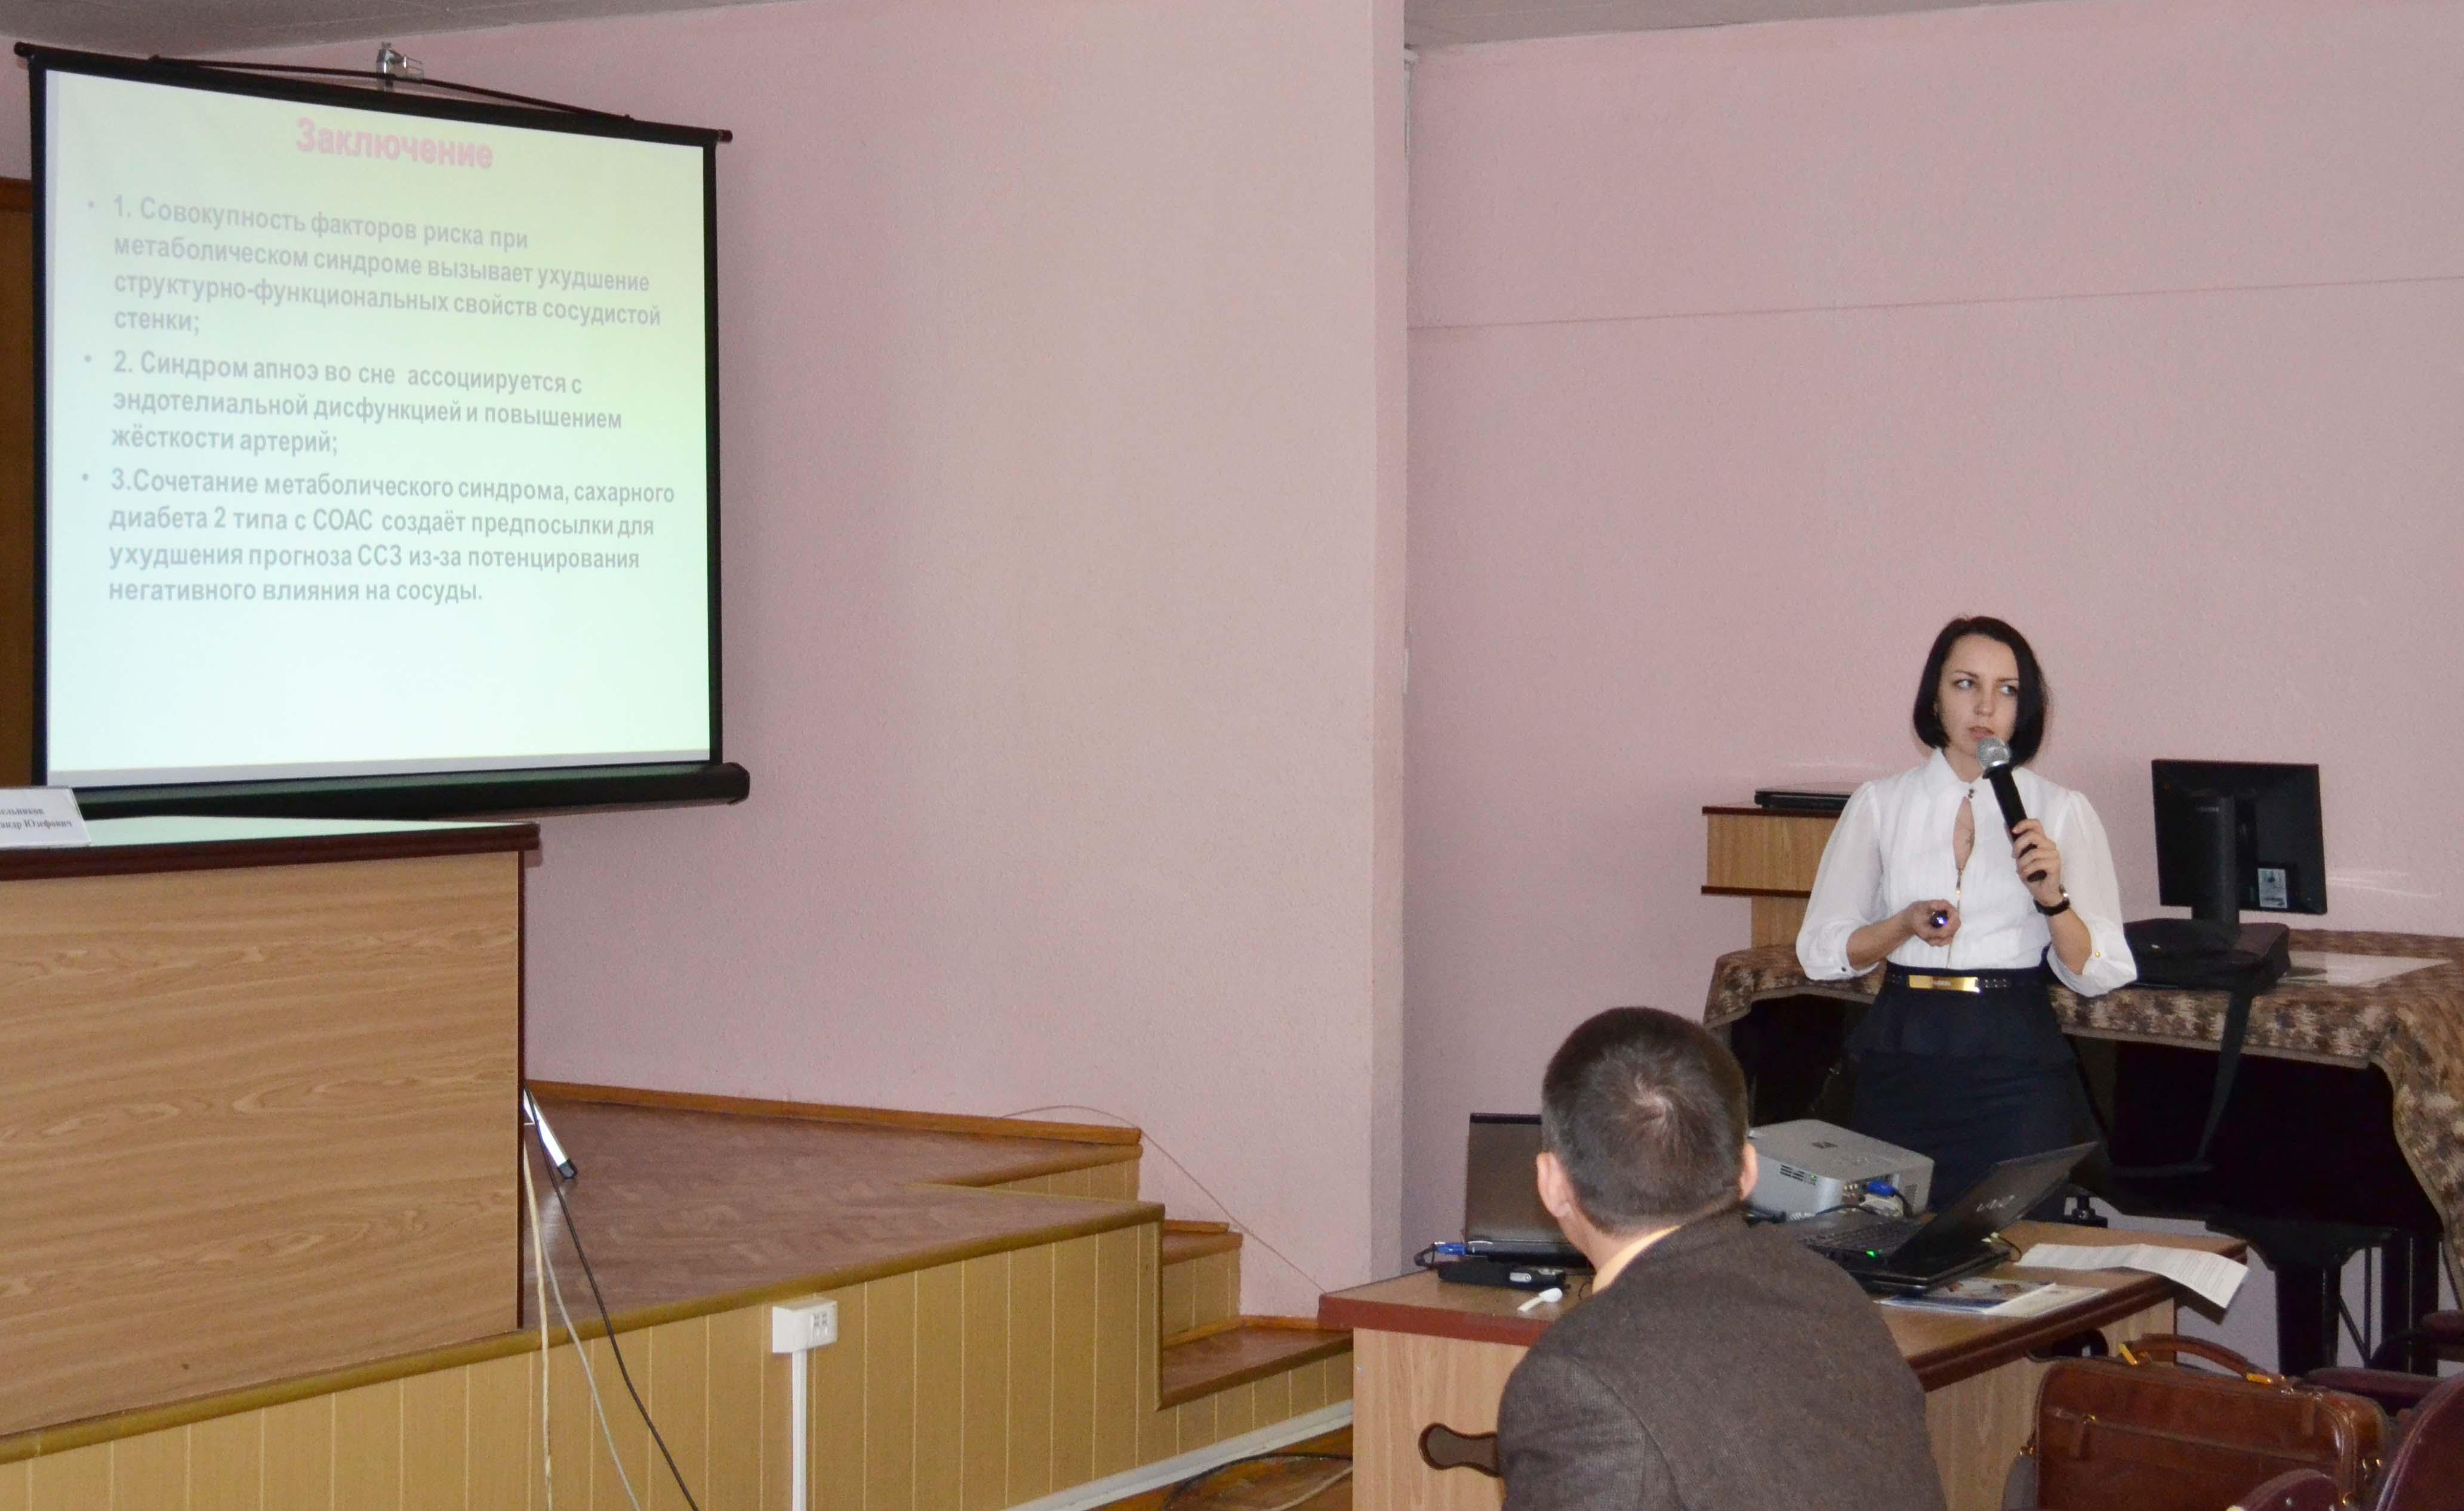 Пенза рекорд посещаемости школ семинаров ru Заключение Пенза рулит